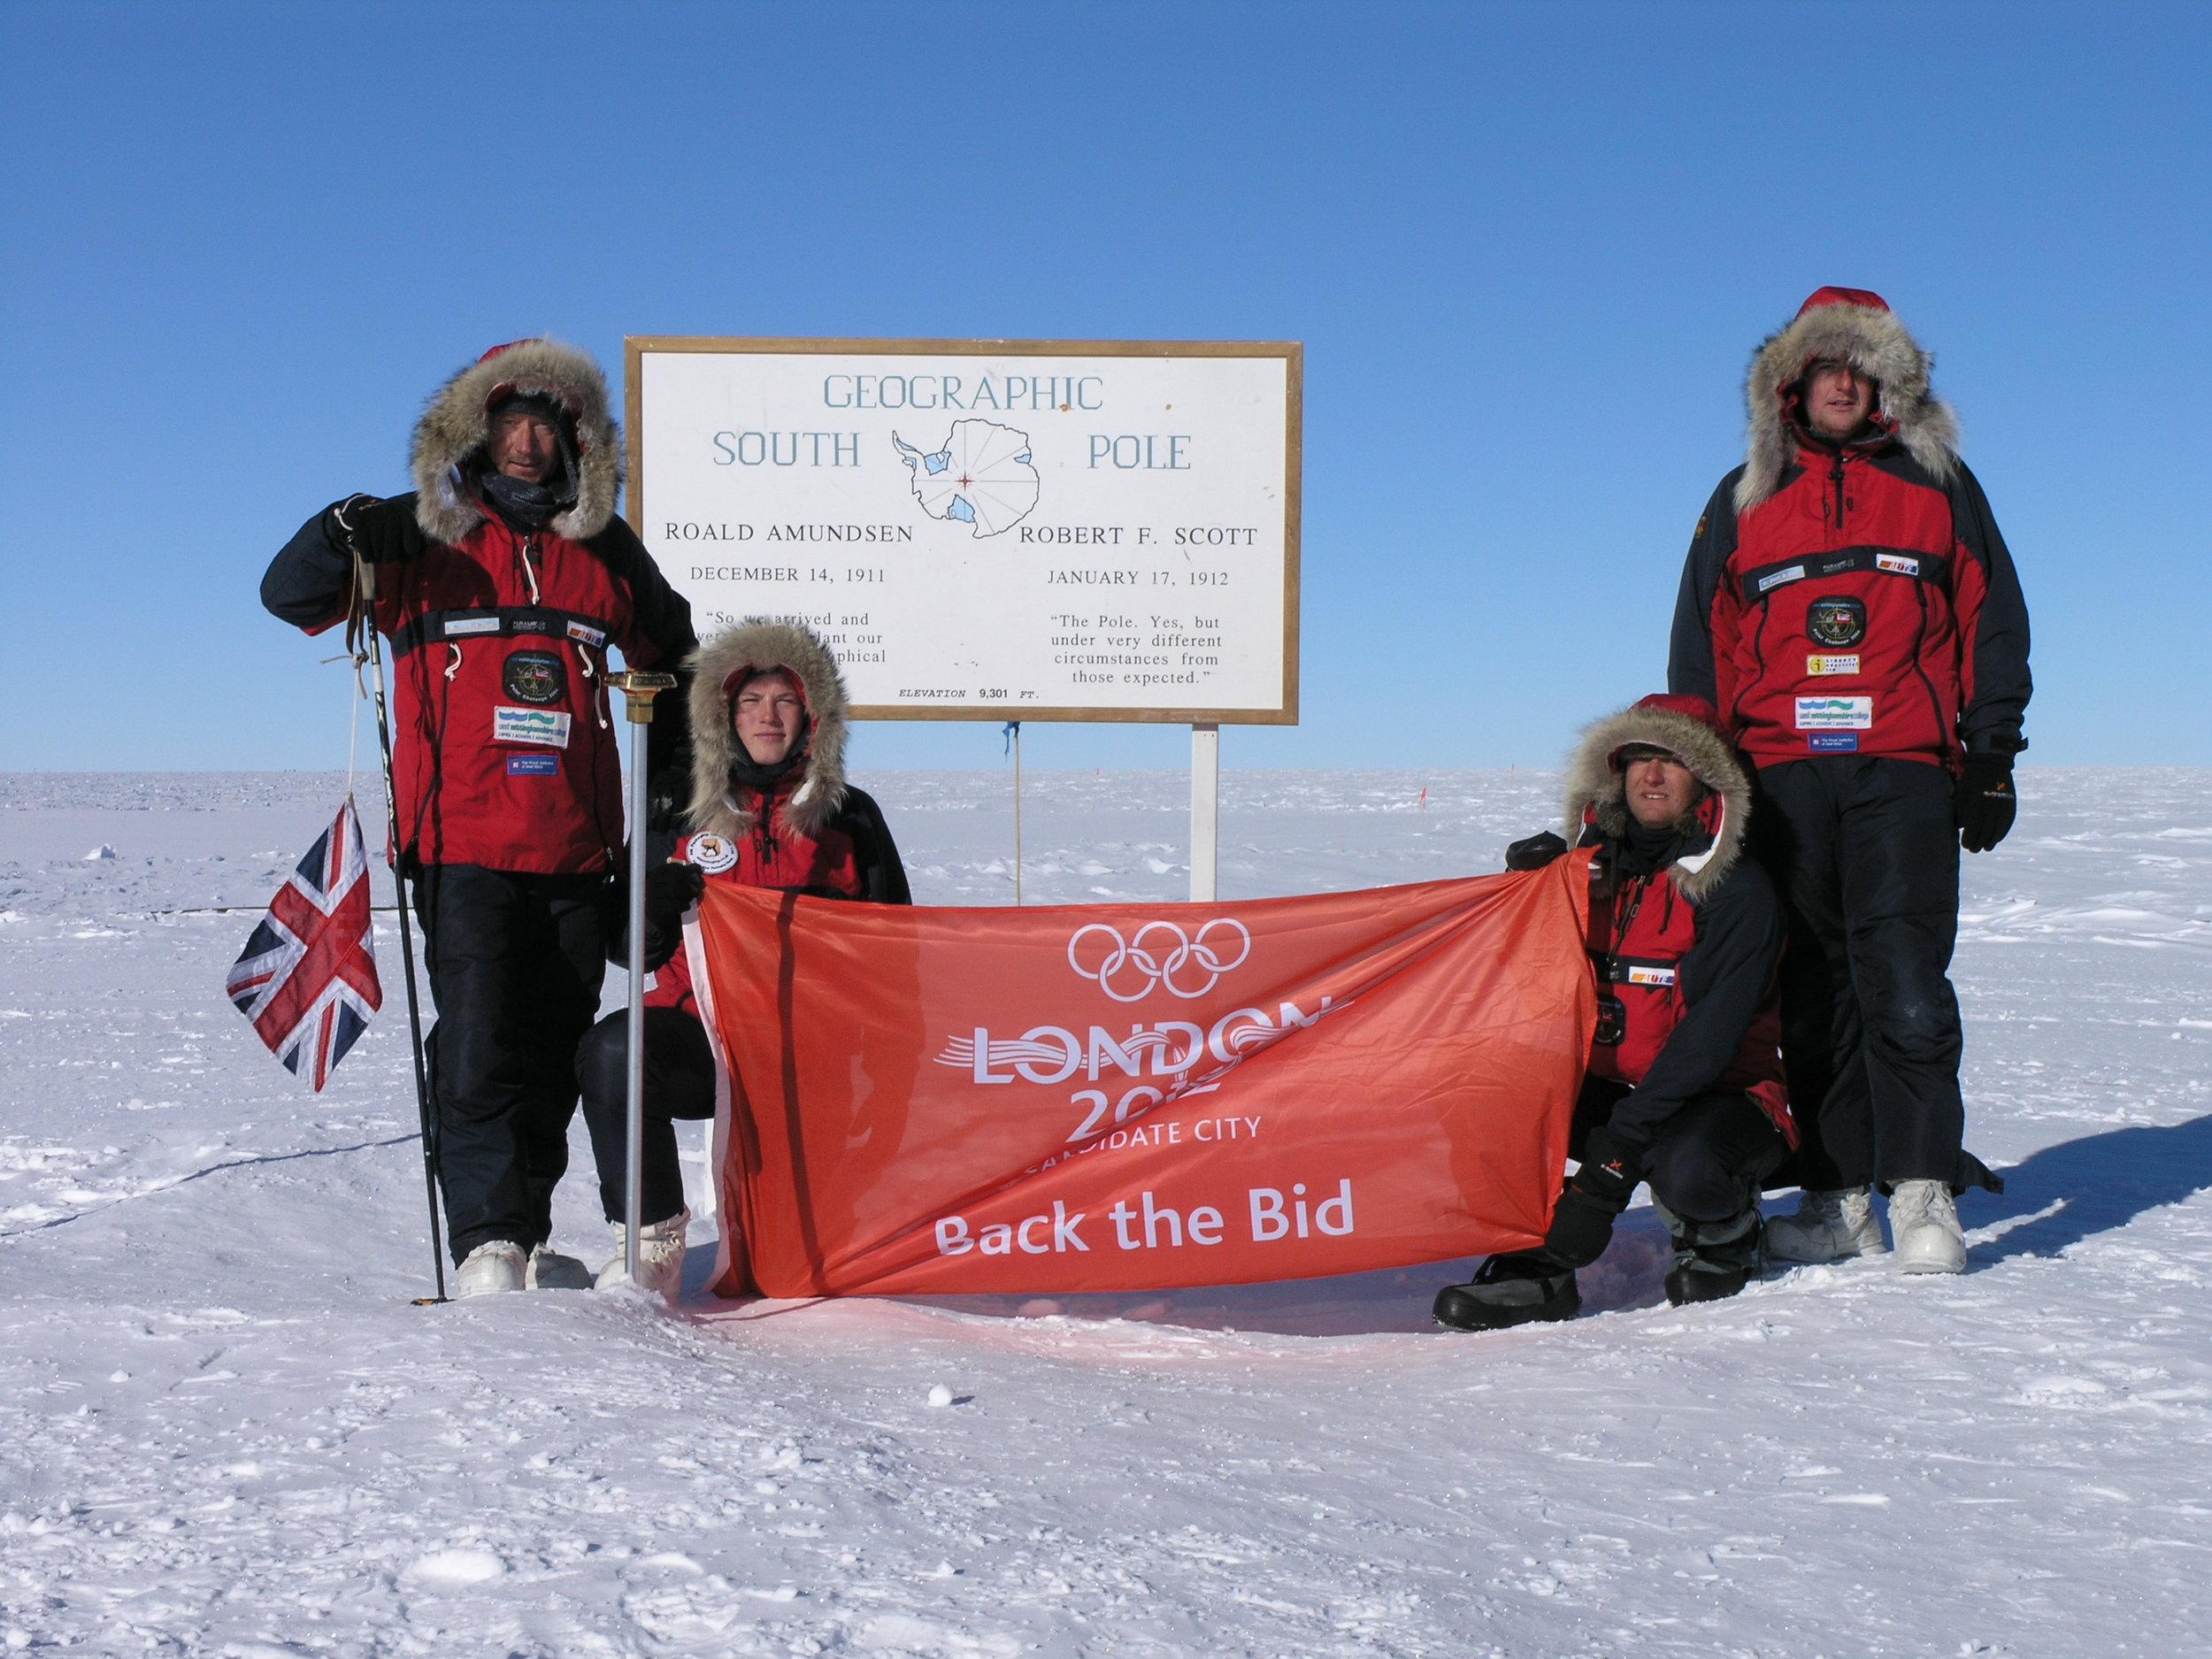 Polar challenge 2004 -